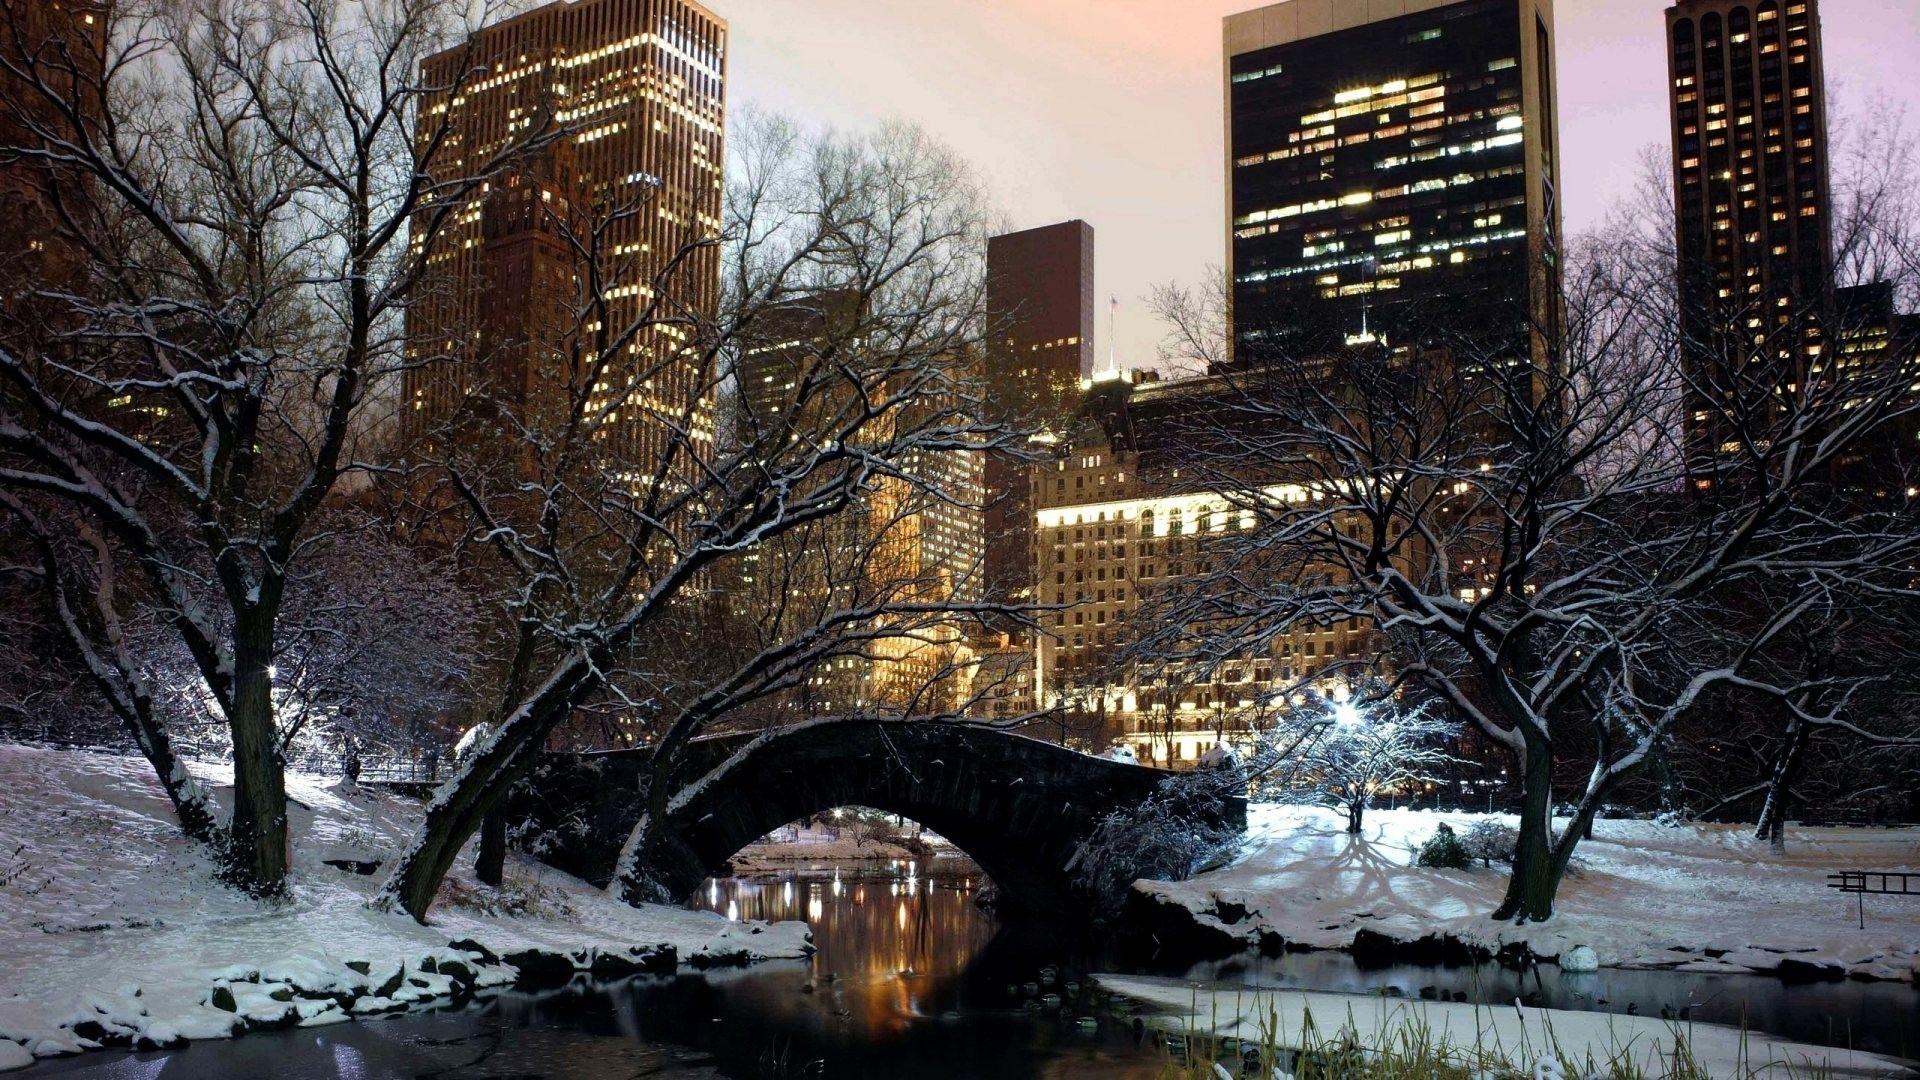 New York Winter Wallpapers   Top New York Winter Backgrounds 1920x1080